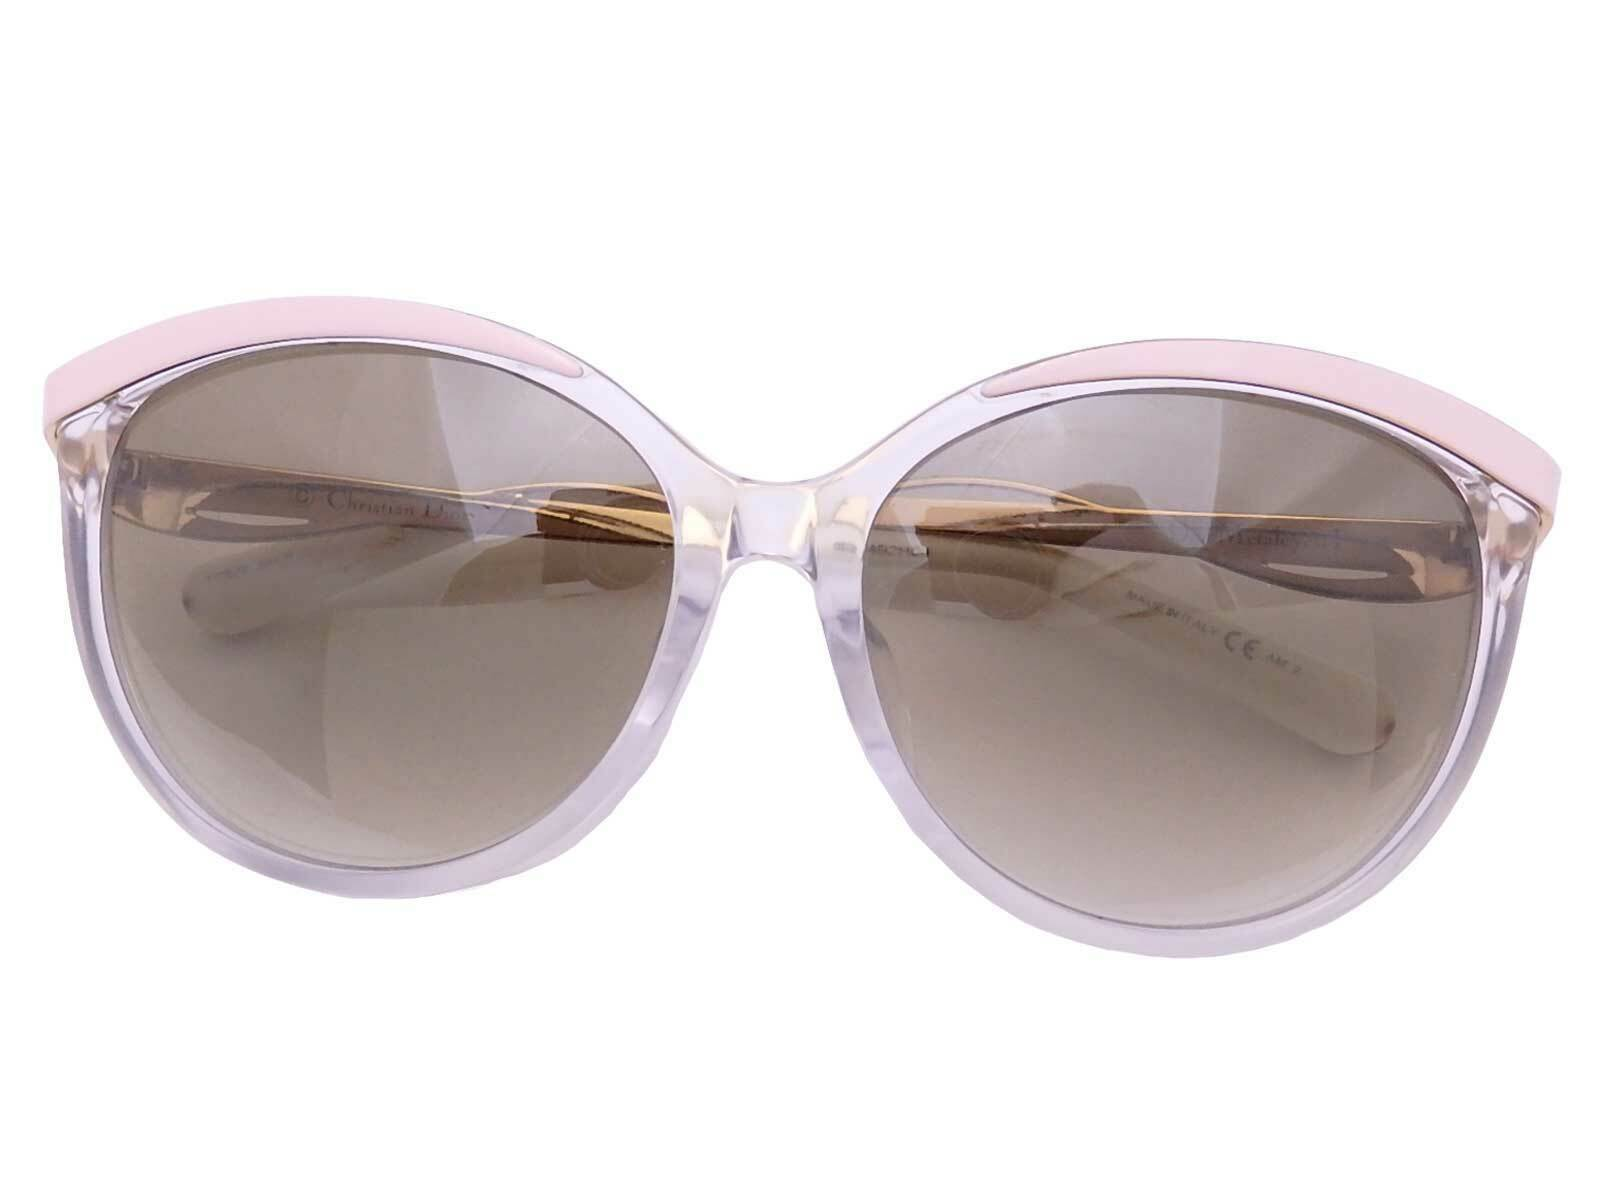 Auth Christian Dior Sunglasses Pink/Yellow/White Gradation Brown - e47372a